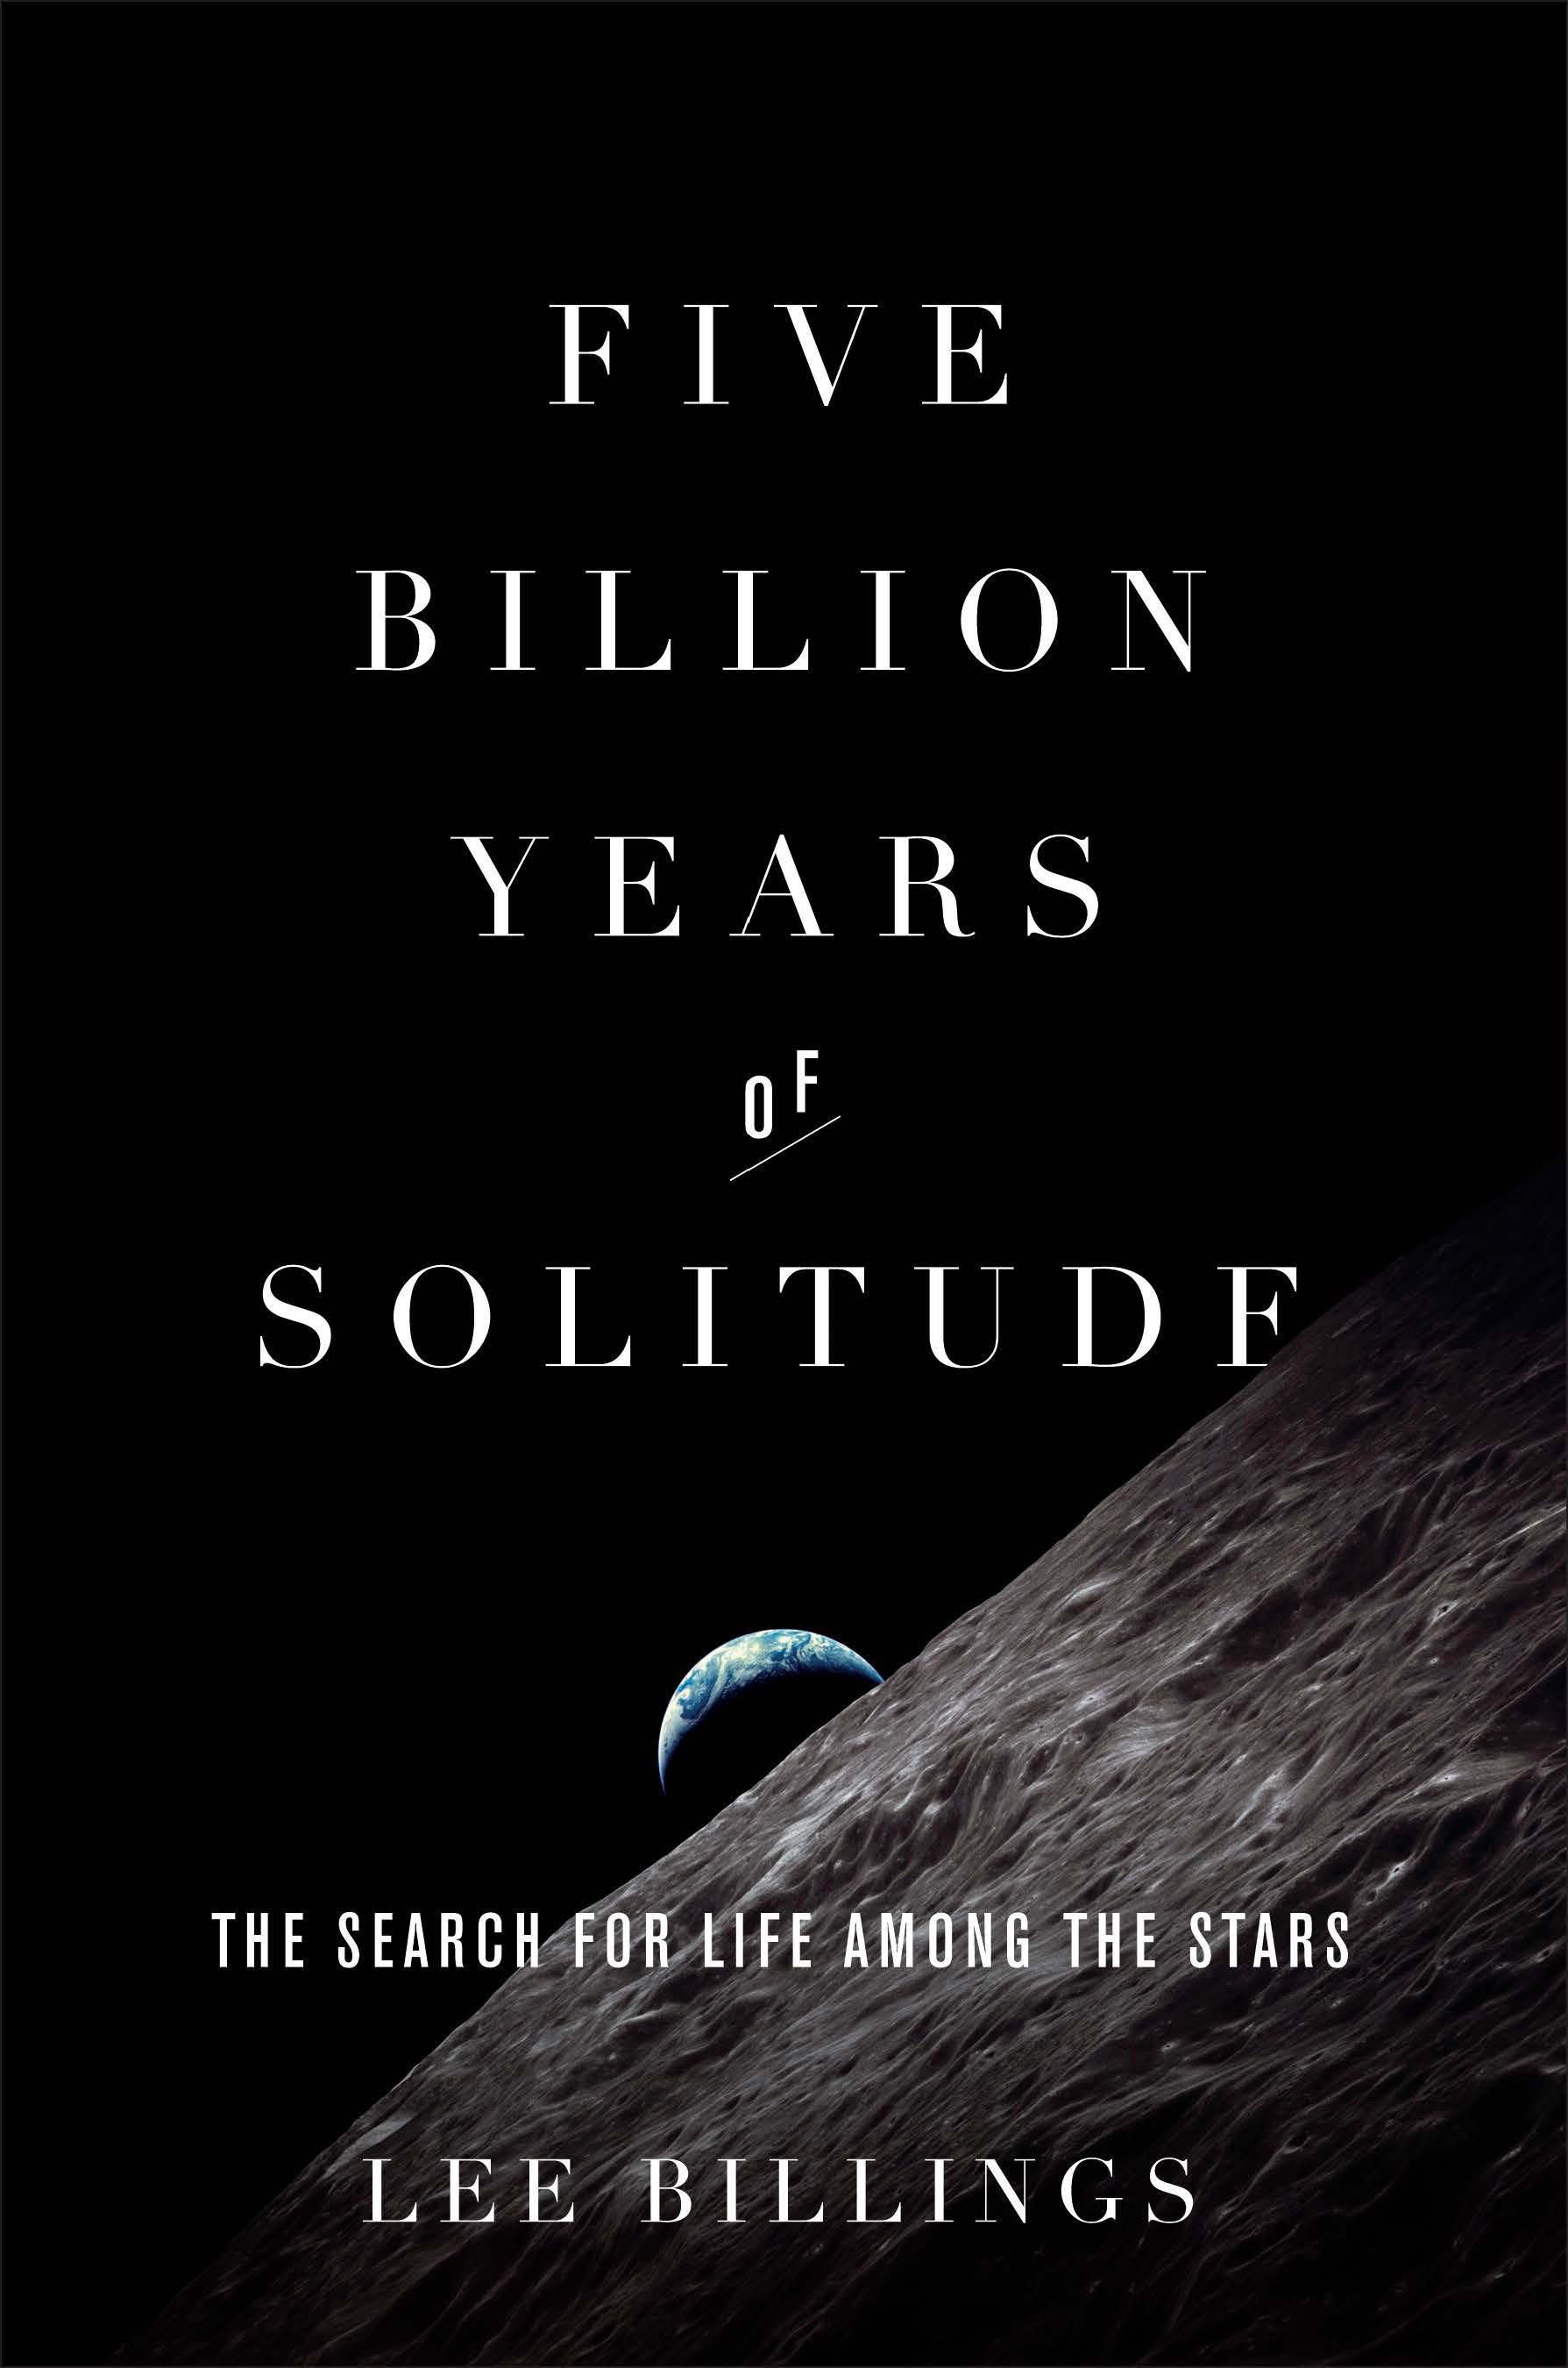 Five Billion Years